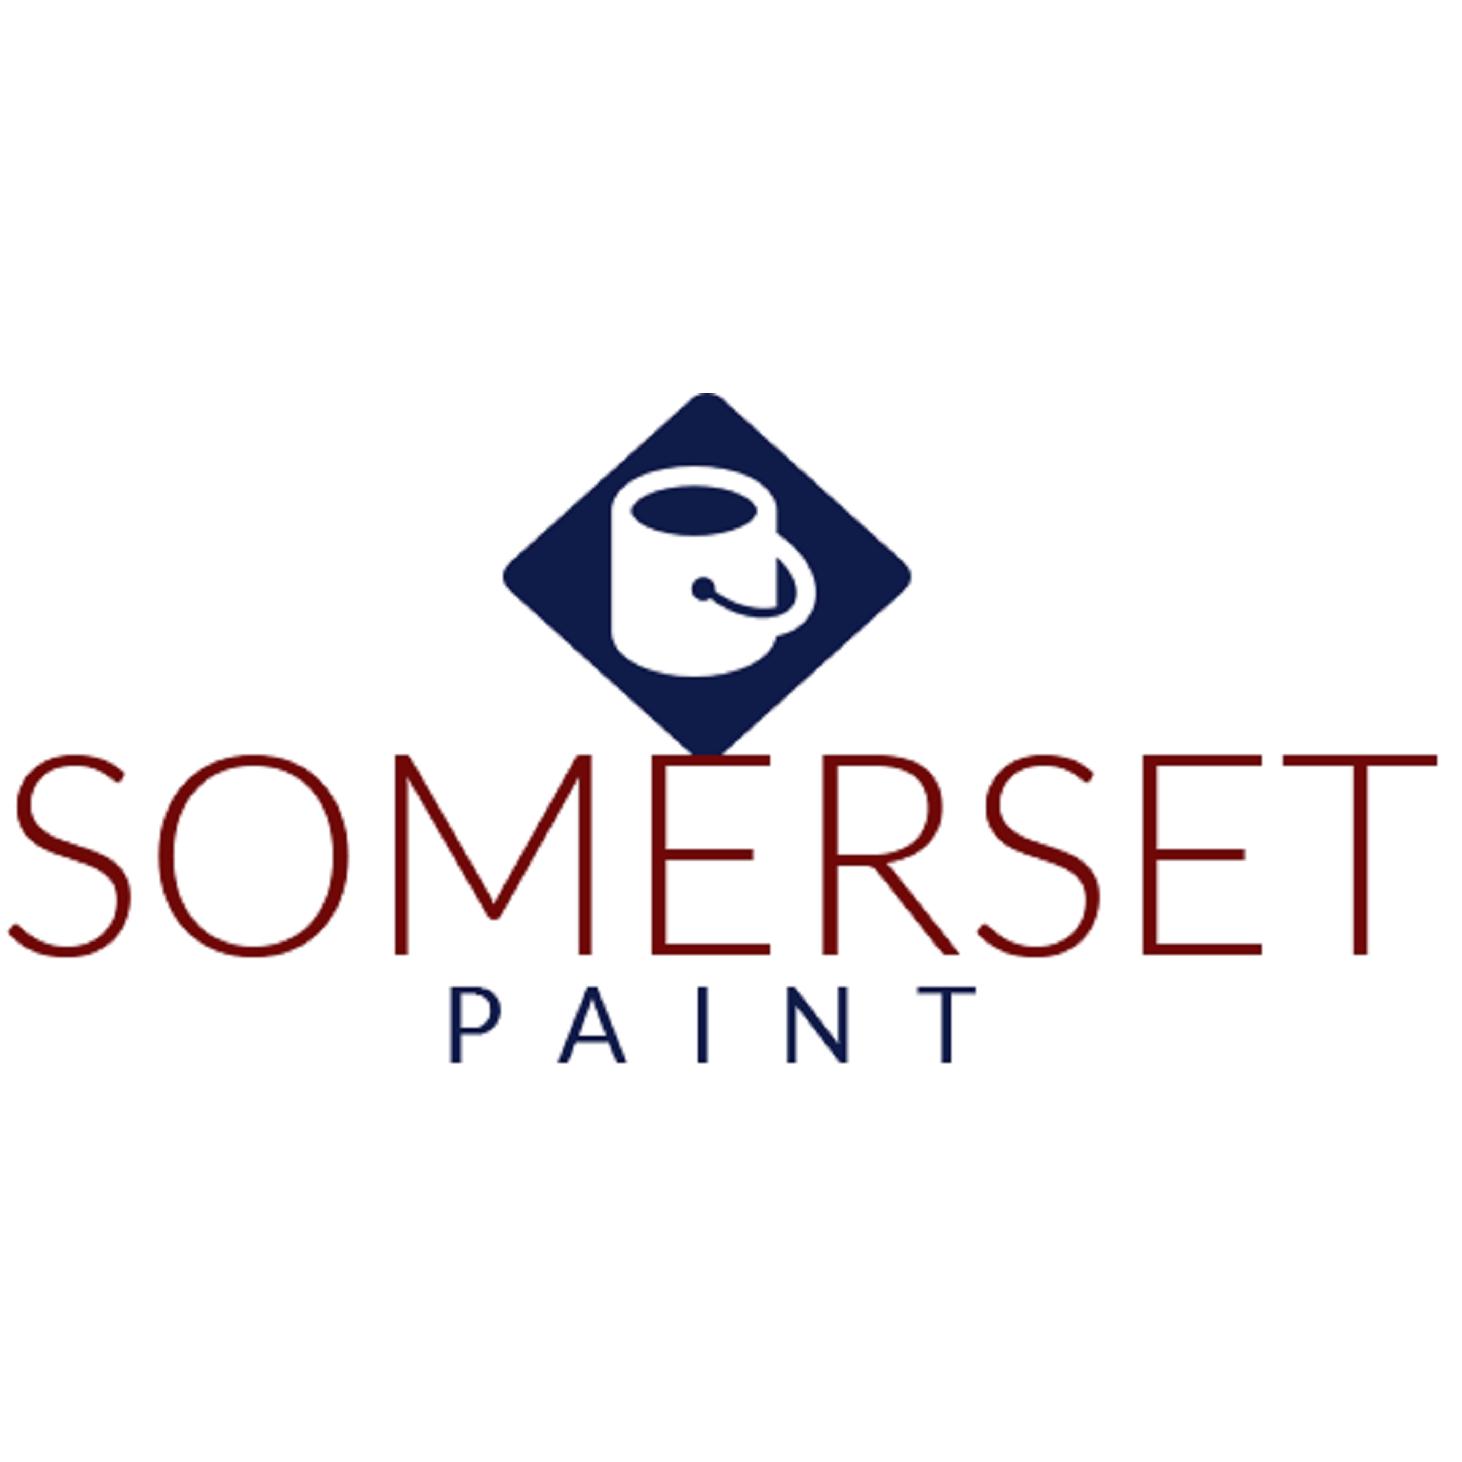 Somerset Paint image 3